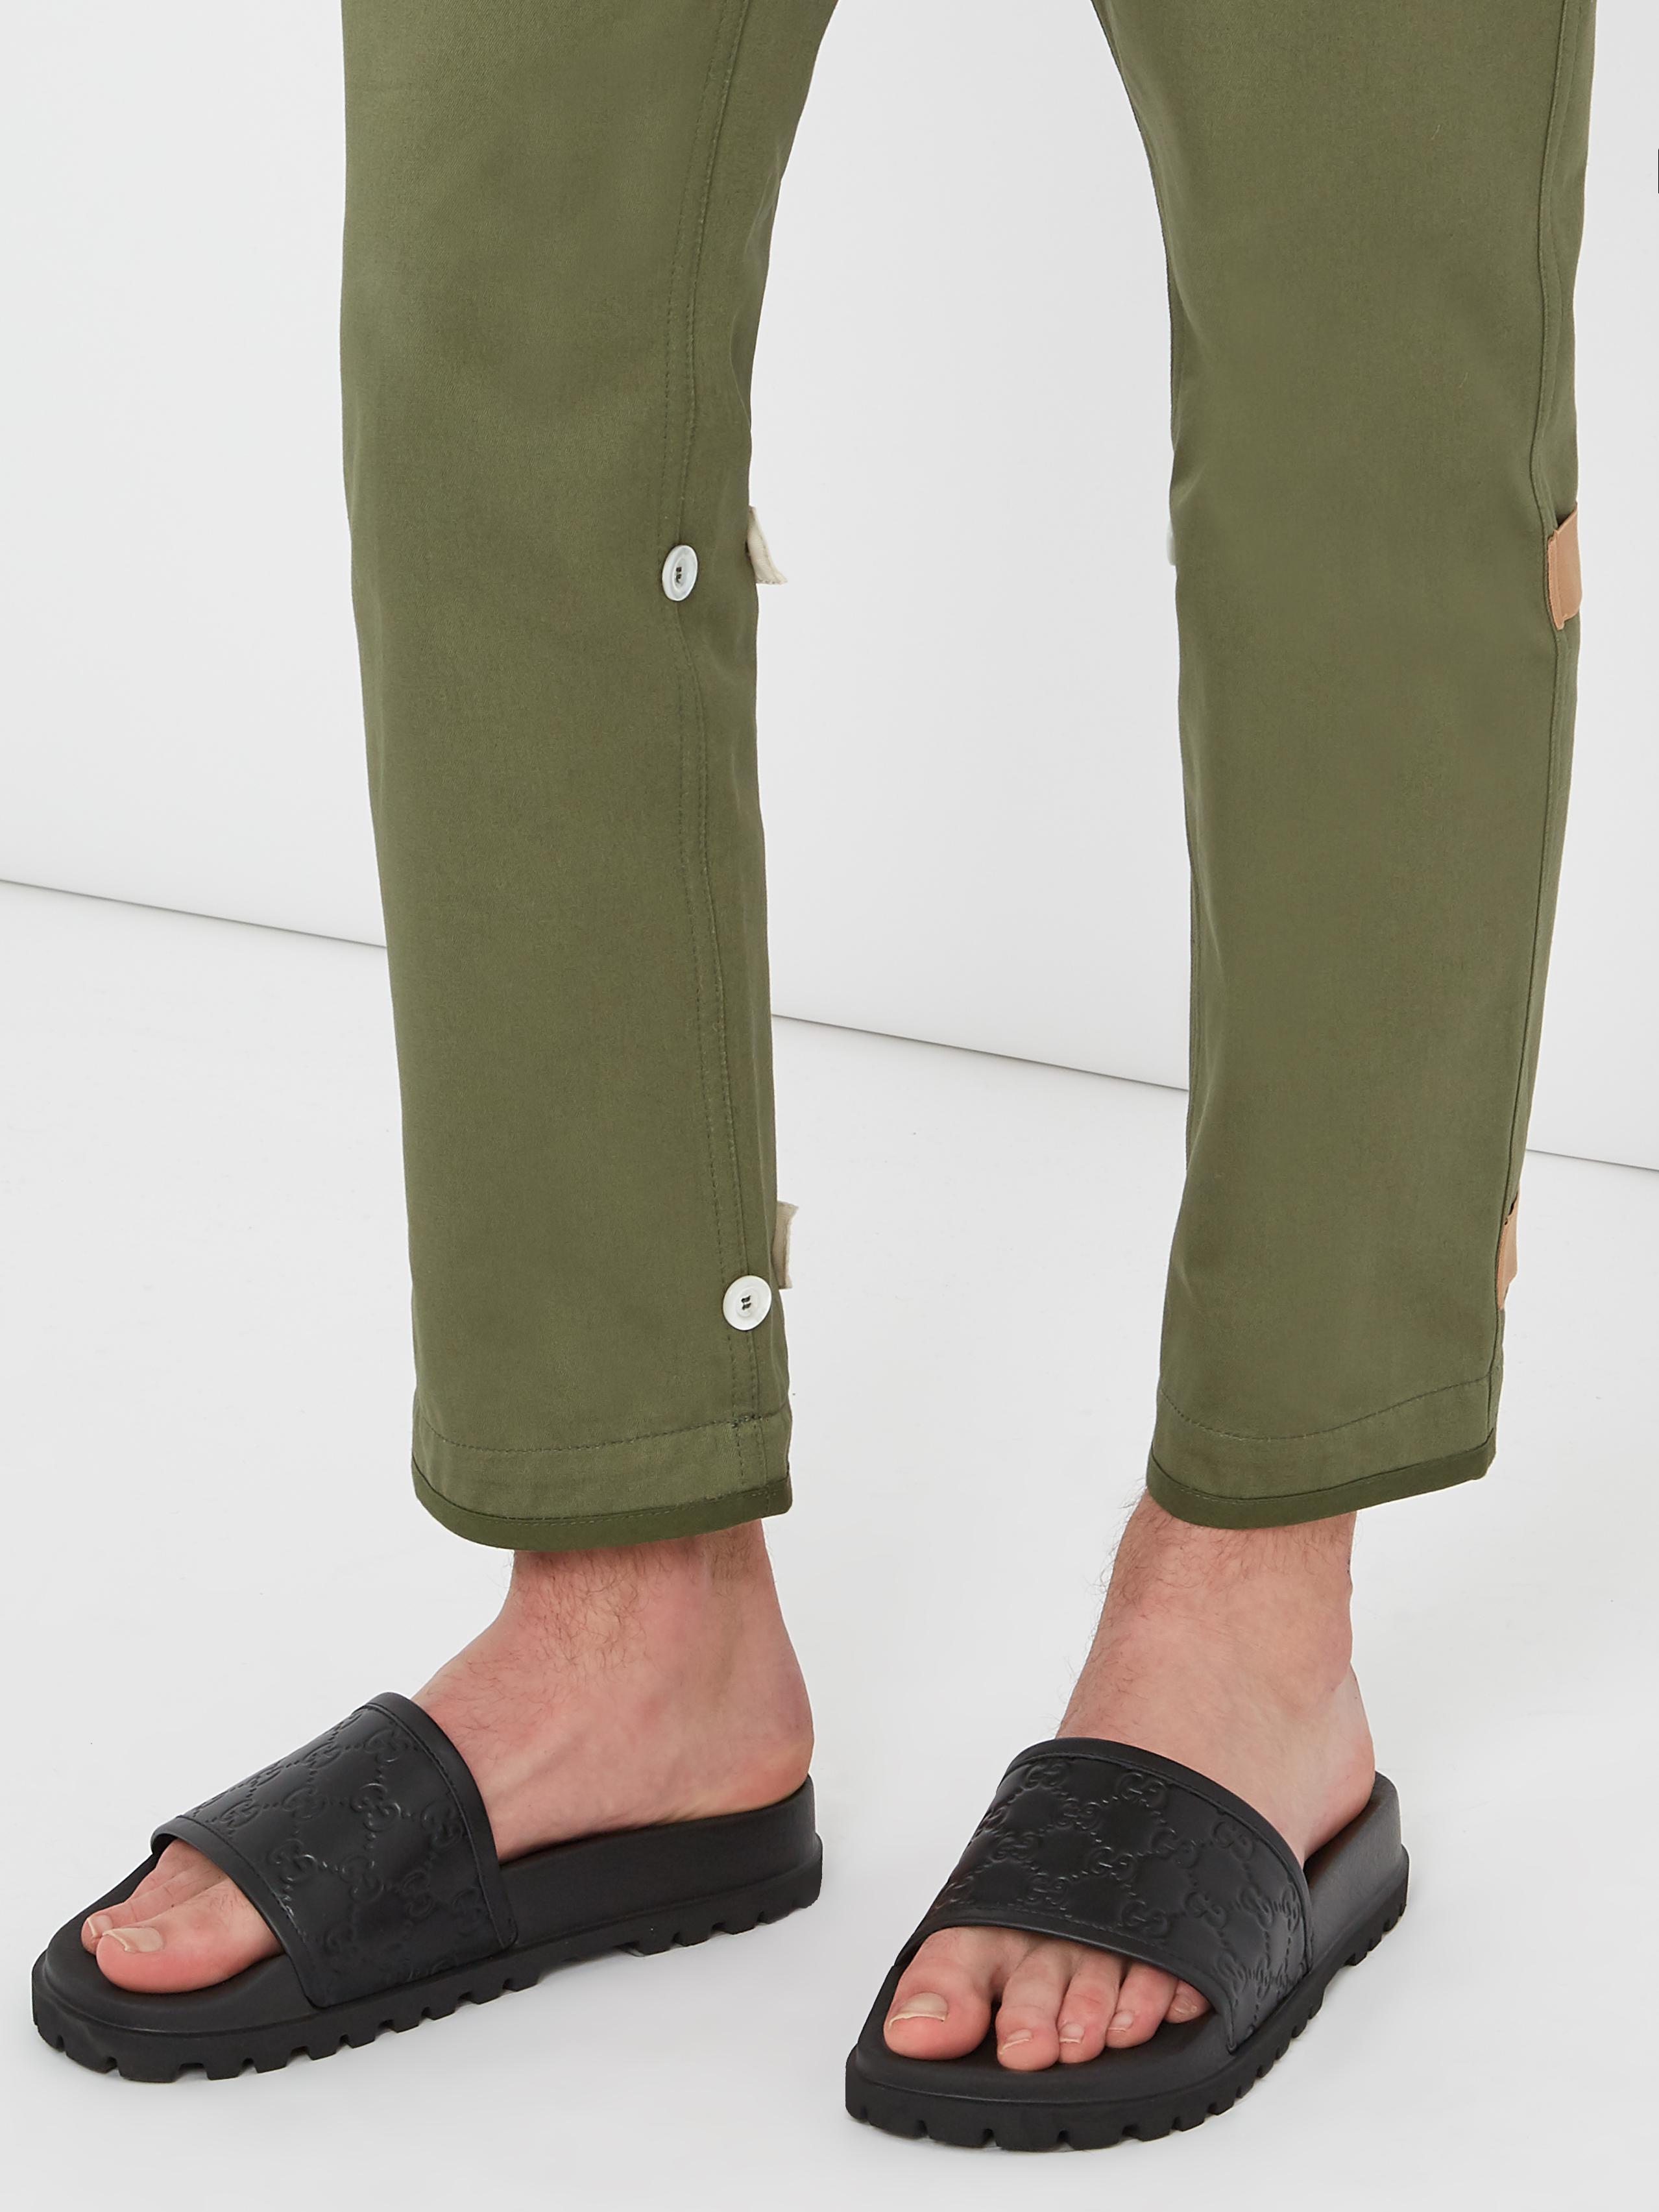 Gucci Pursuit Treck Leather Slides jXLKQD